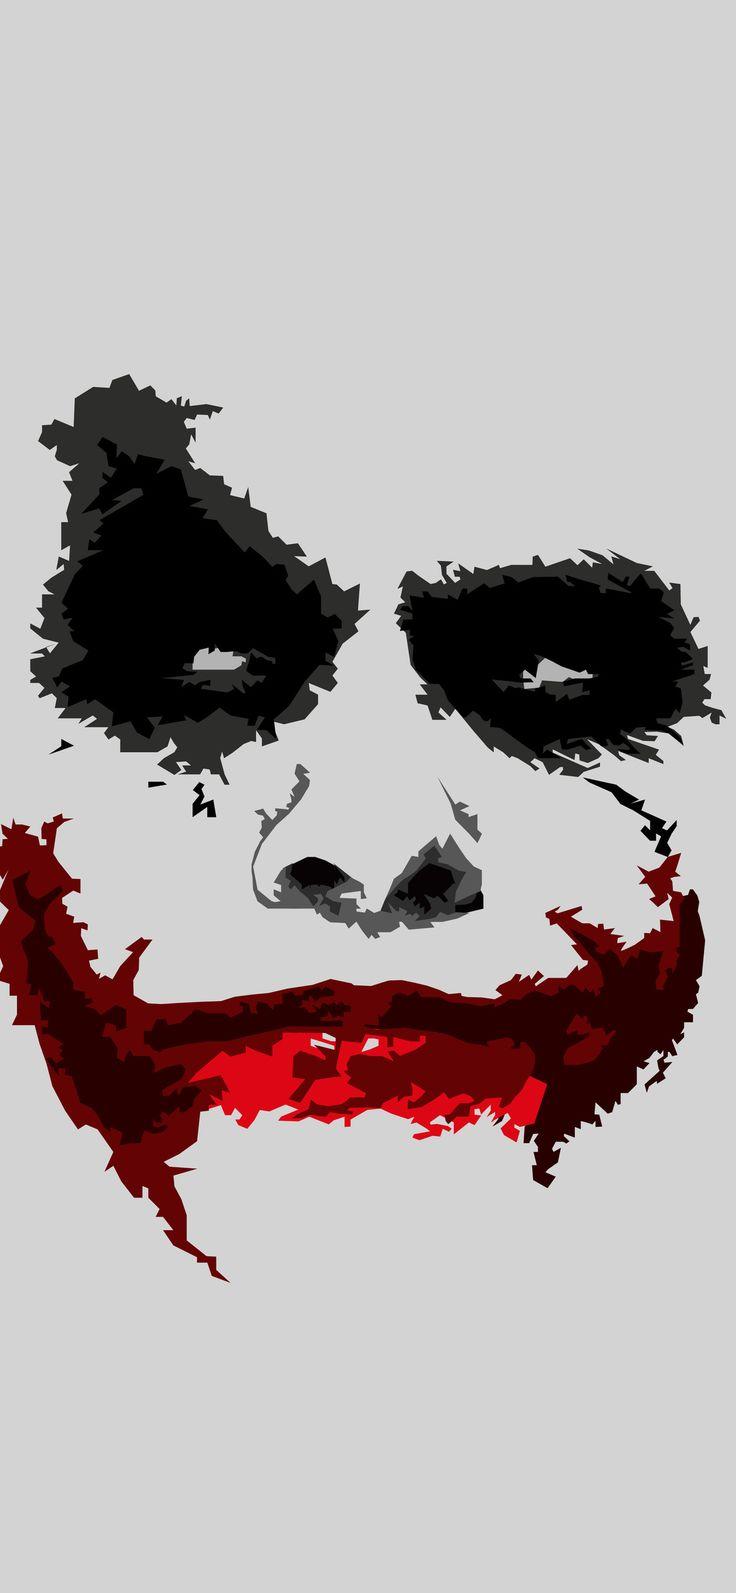 Joker 8k Minimalism Iphone X Joker iphone wallpaper